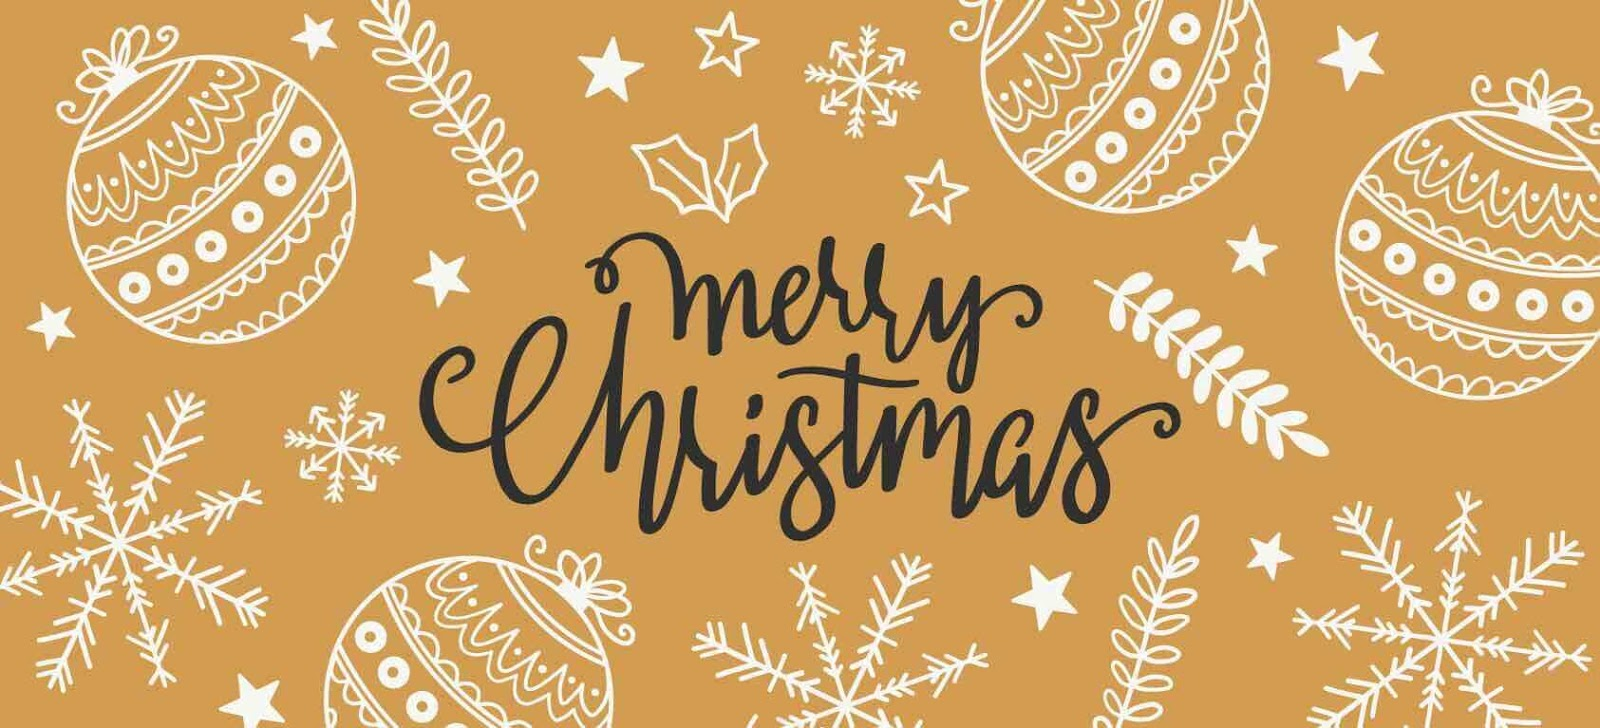 Christmas Banner Design Download Free